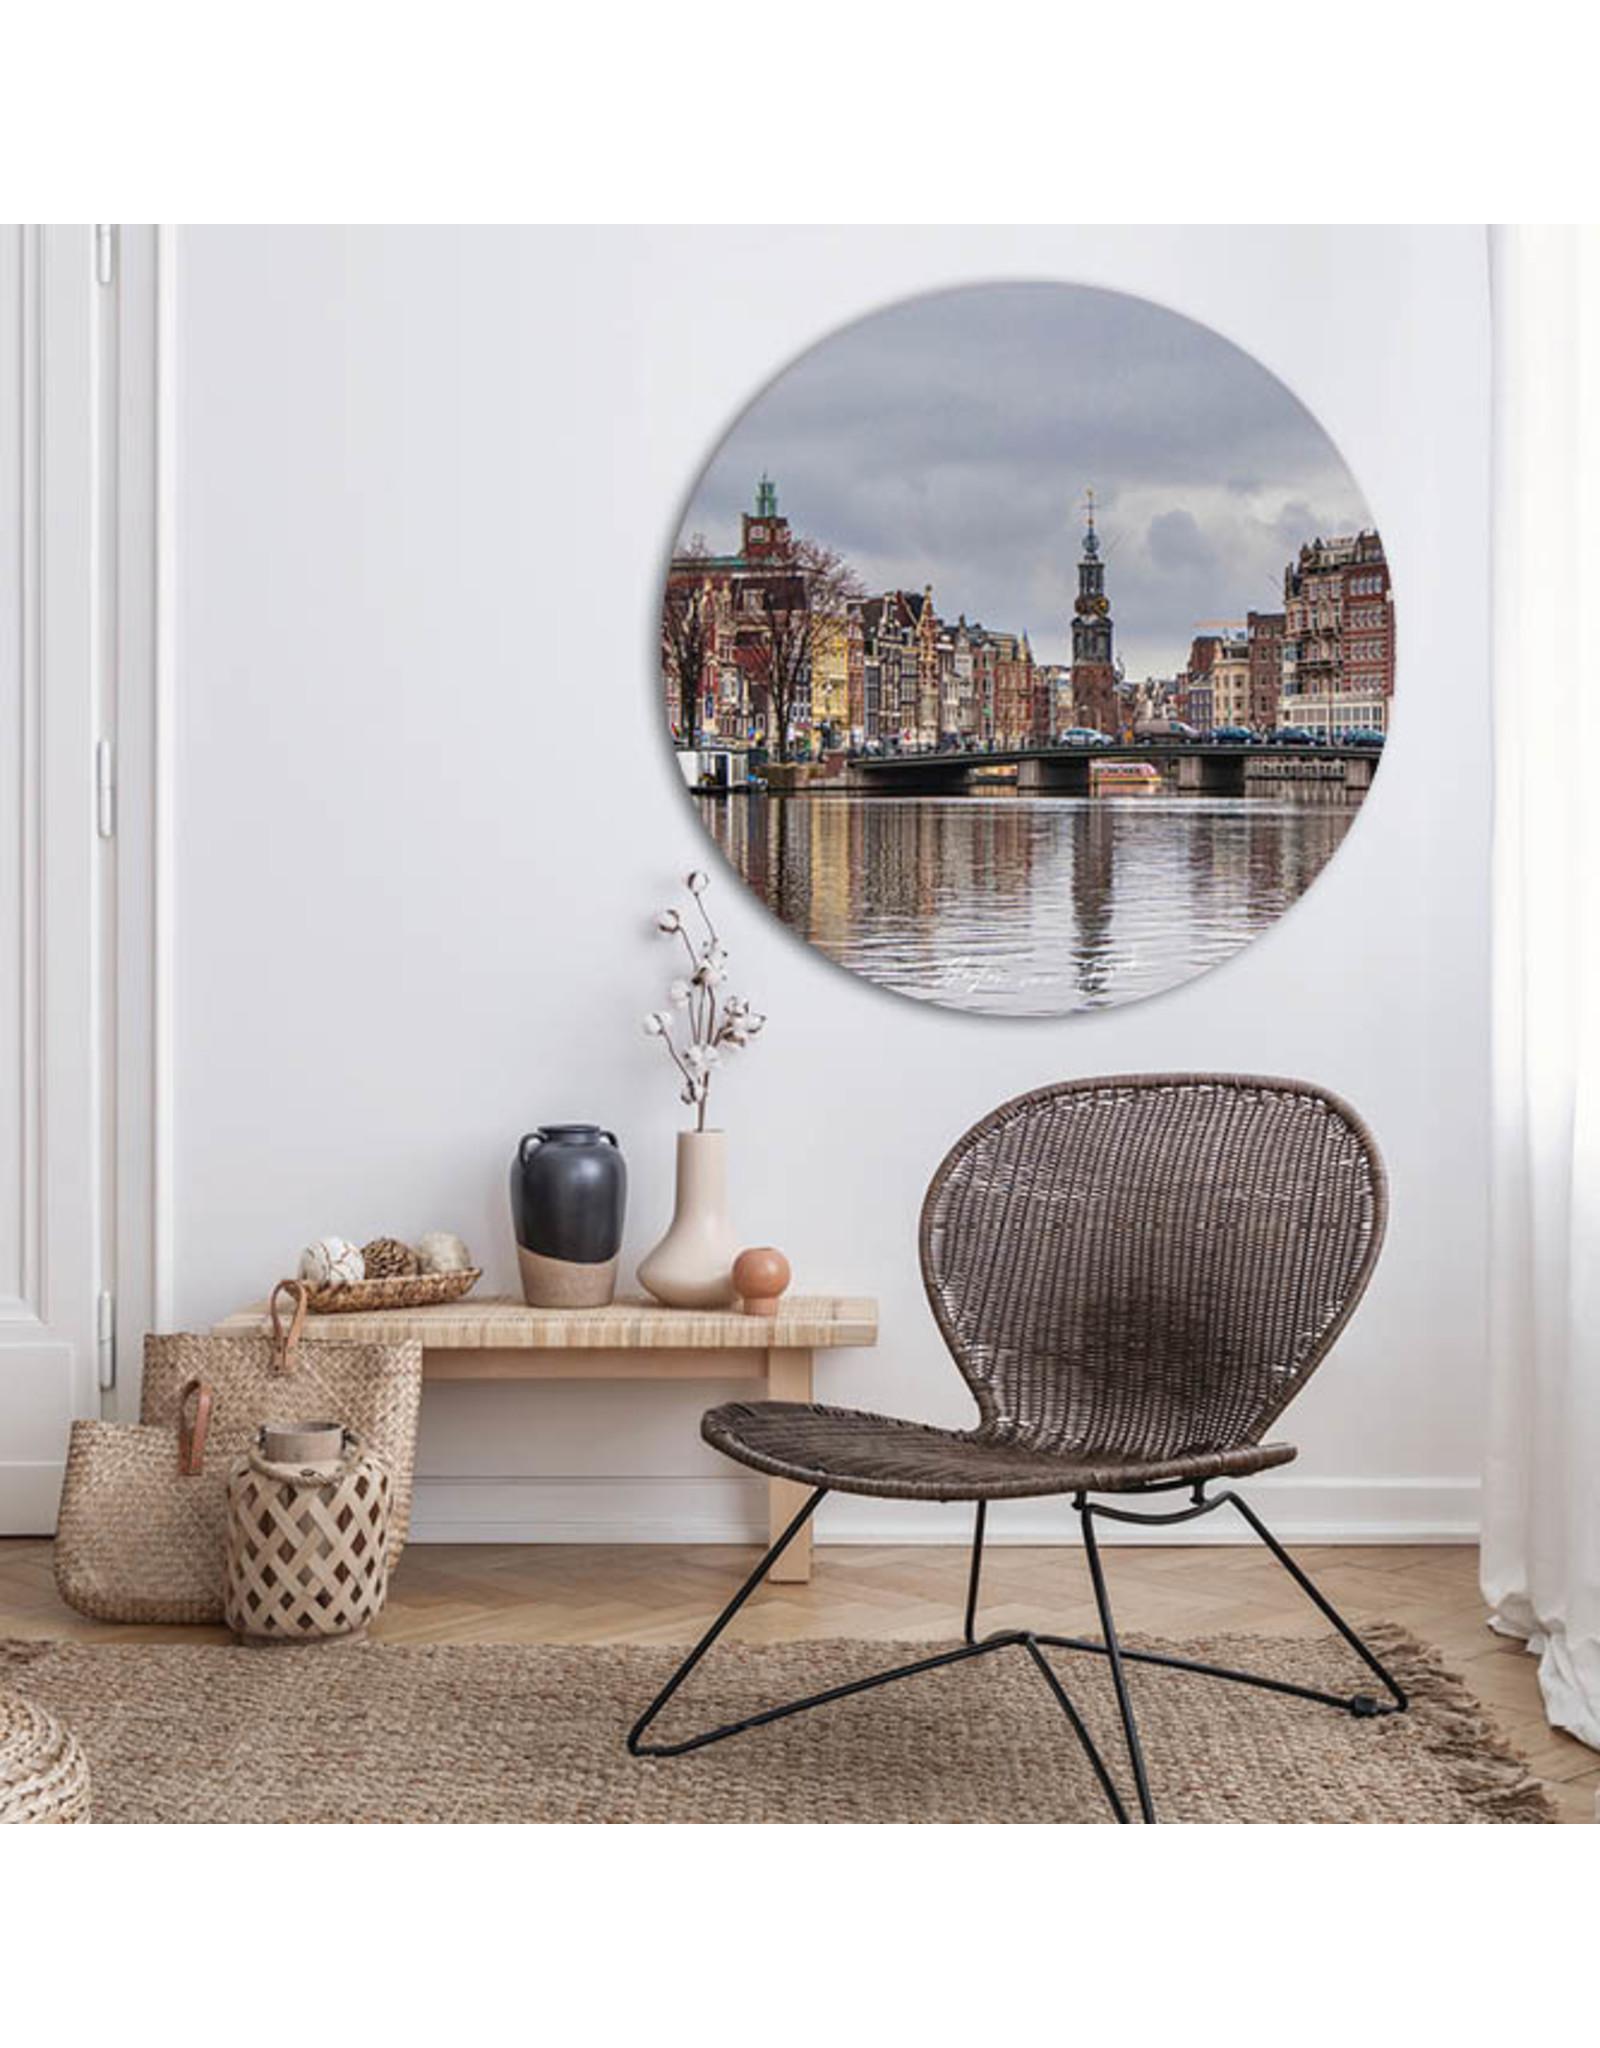 Dunnebier Home Muursticker Amsterdam_3 - verwijderbaar